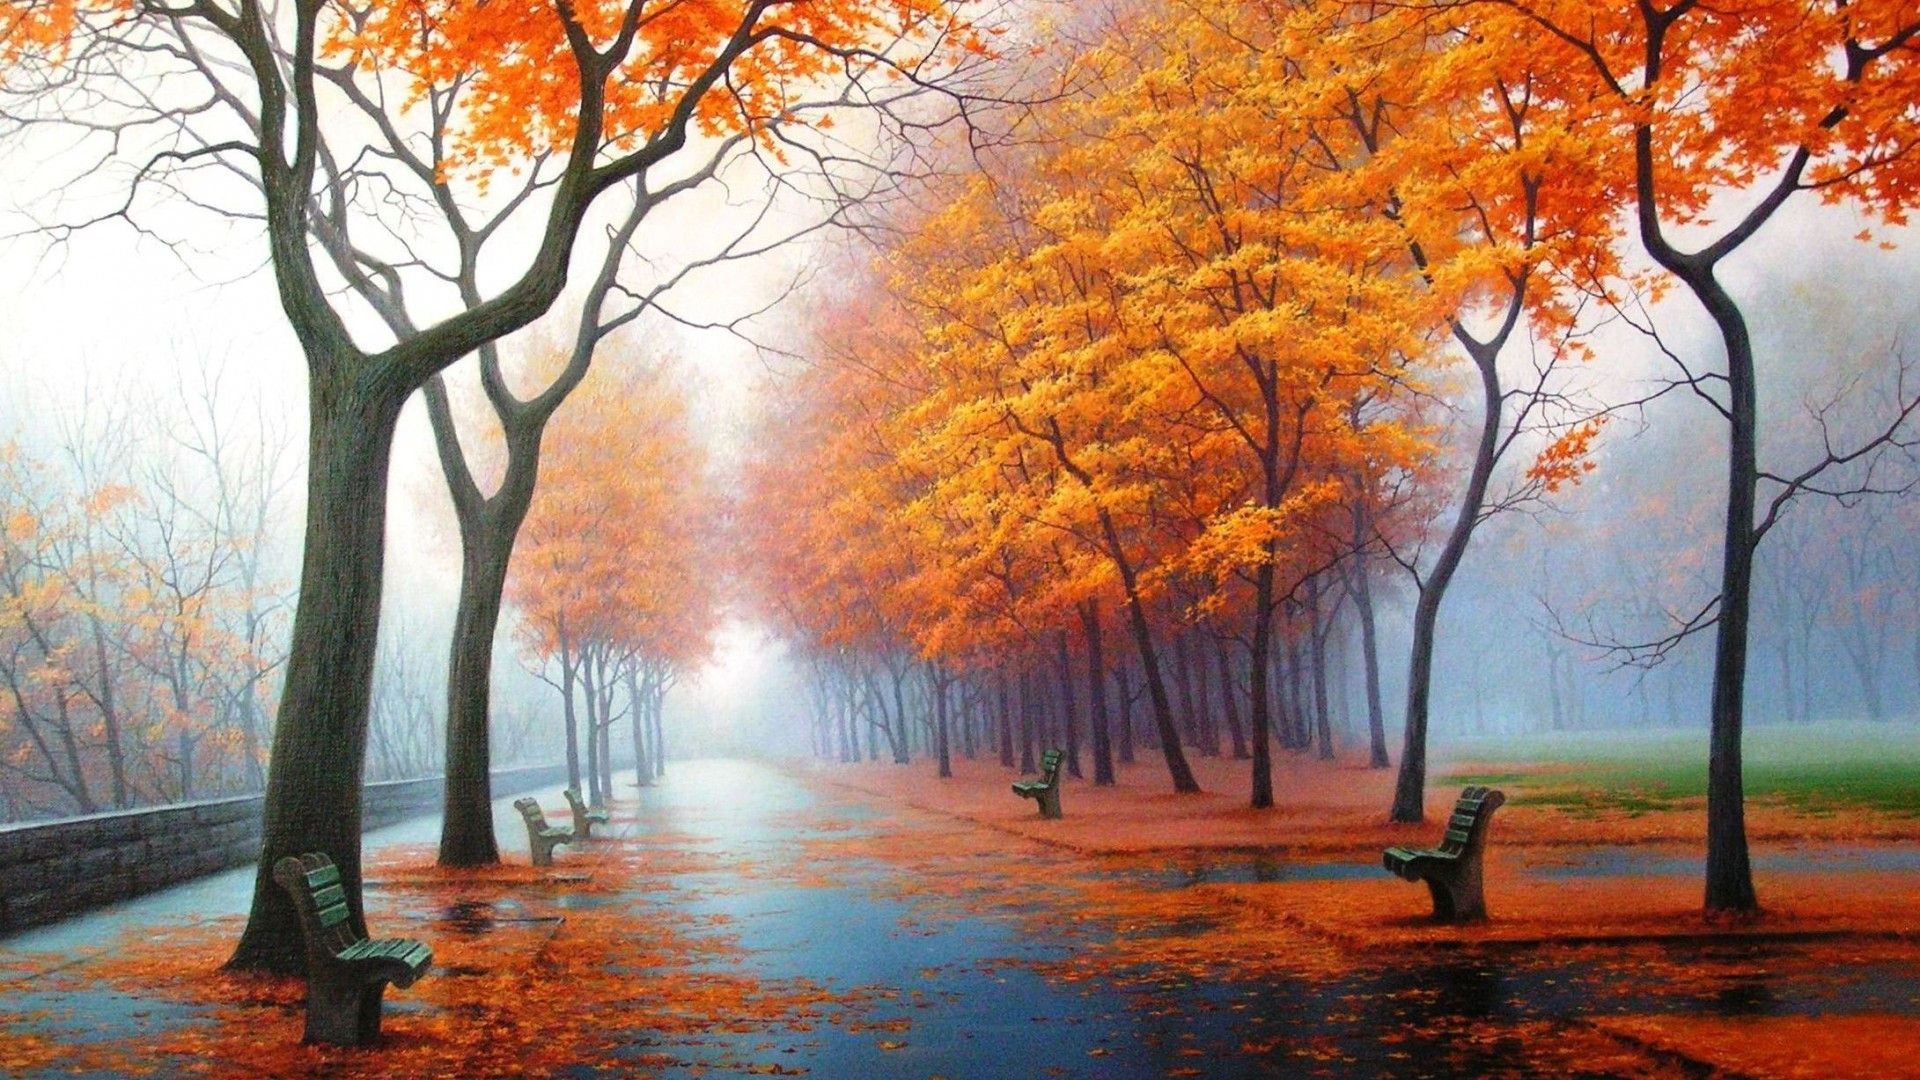 Autumn Rain Park Leaf Bench Wallpaper Mixhd Wallpapers Autumn Wallpaper Hd Nature Wallpaper Beautiful Wallpaper Hd